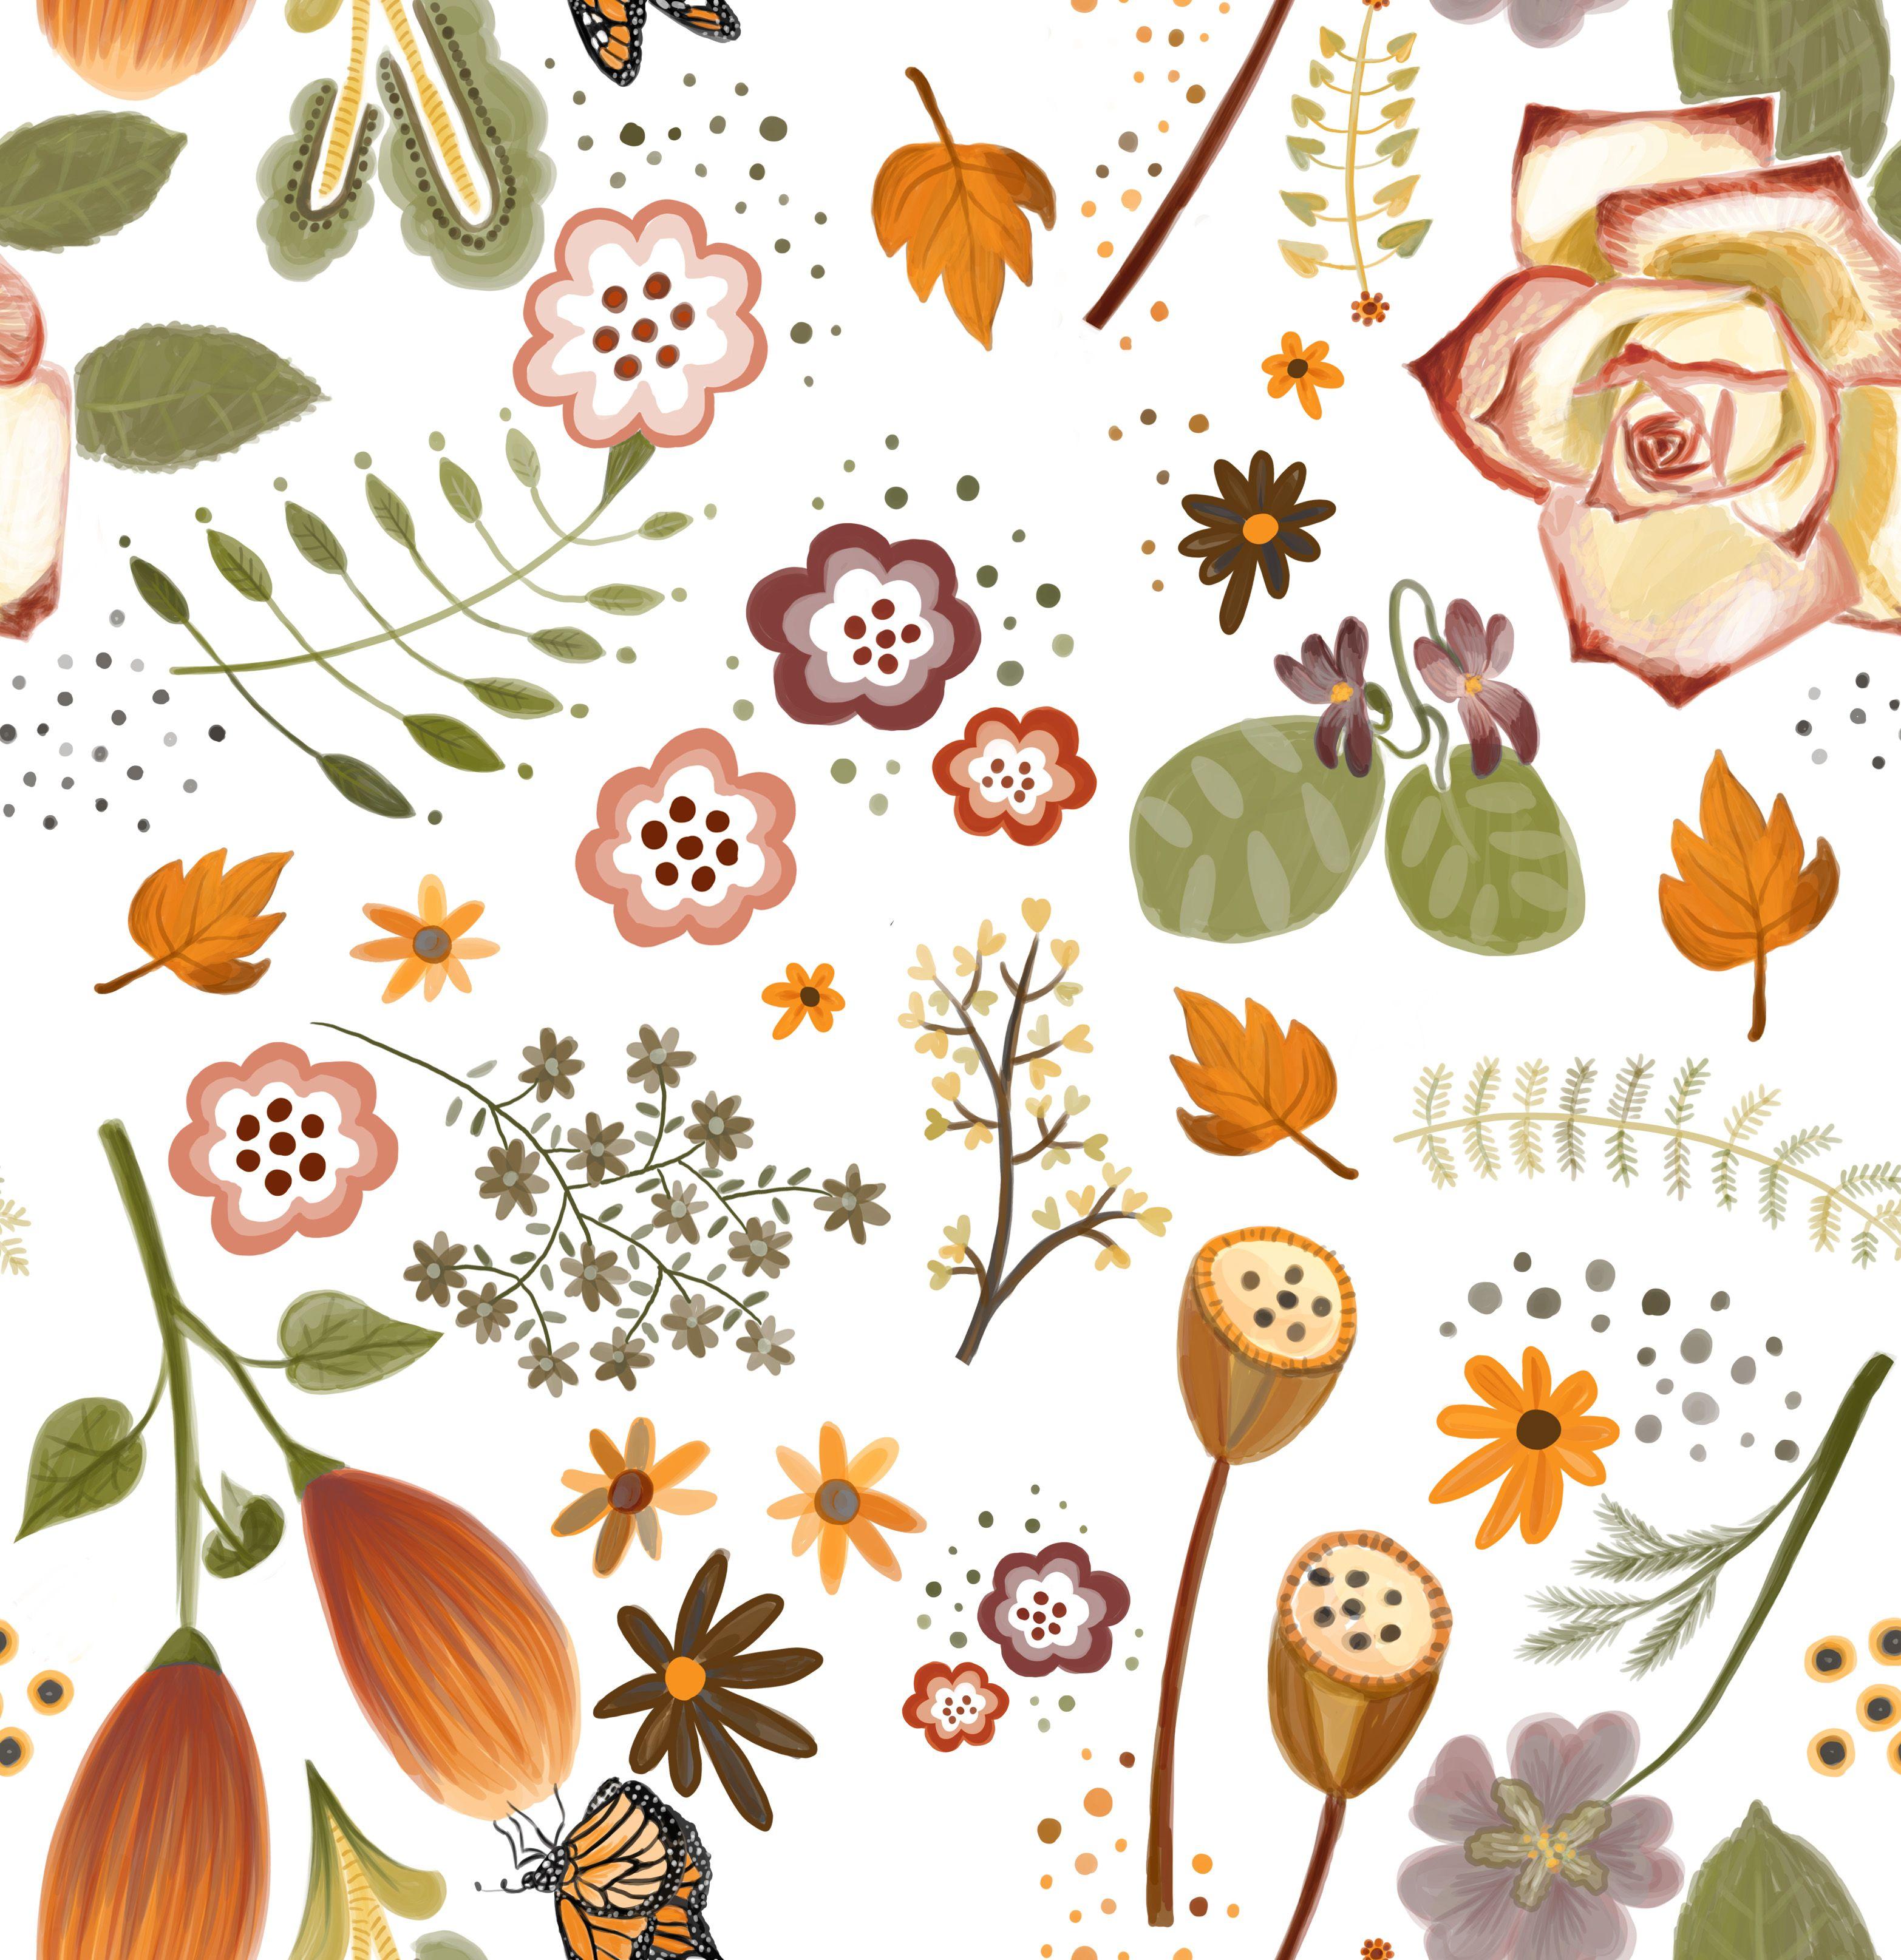 Branka Hollingsworth Autumn Flowers Pattern Digital Illustration 2015 Digital Illustration Fall Flowers Flower Patterns